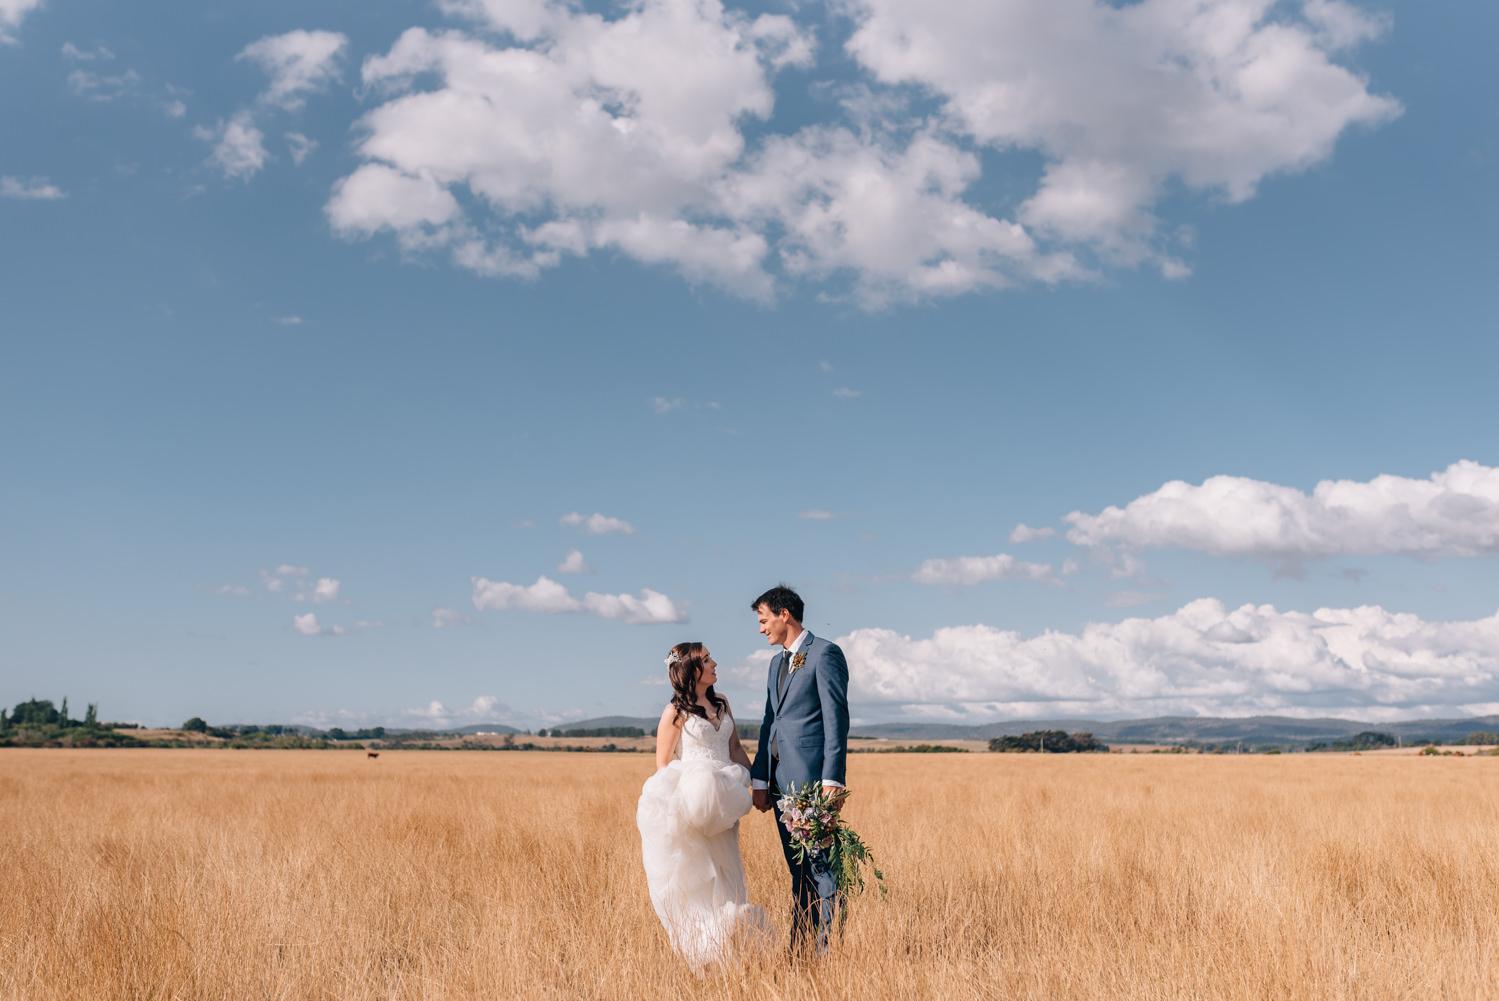 Quamby-Wedding-Photographer-111.jpg